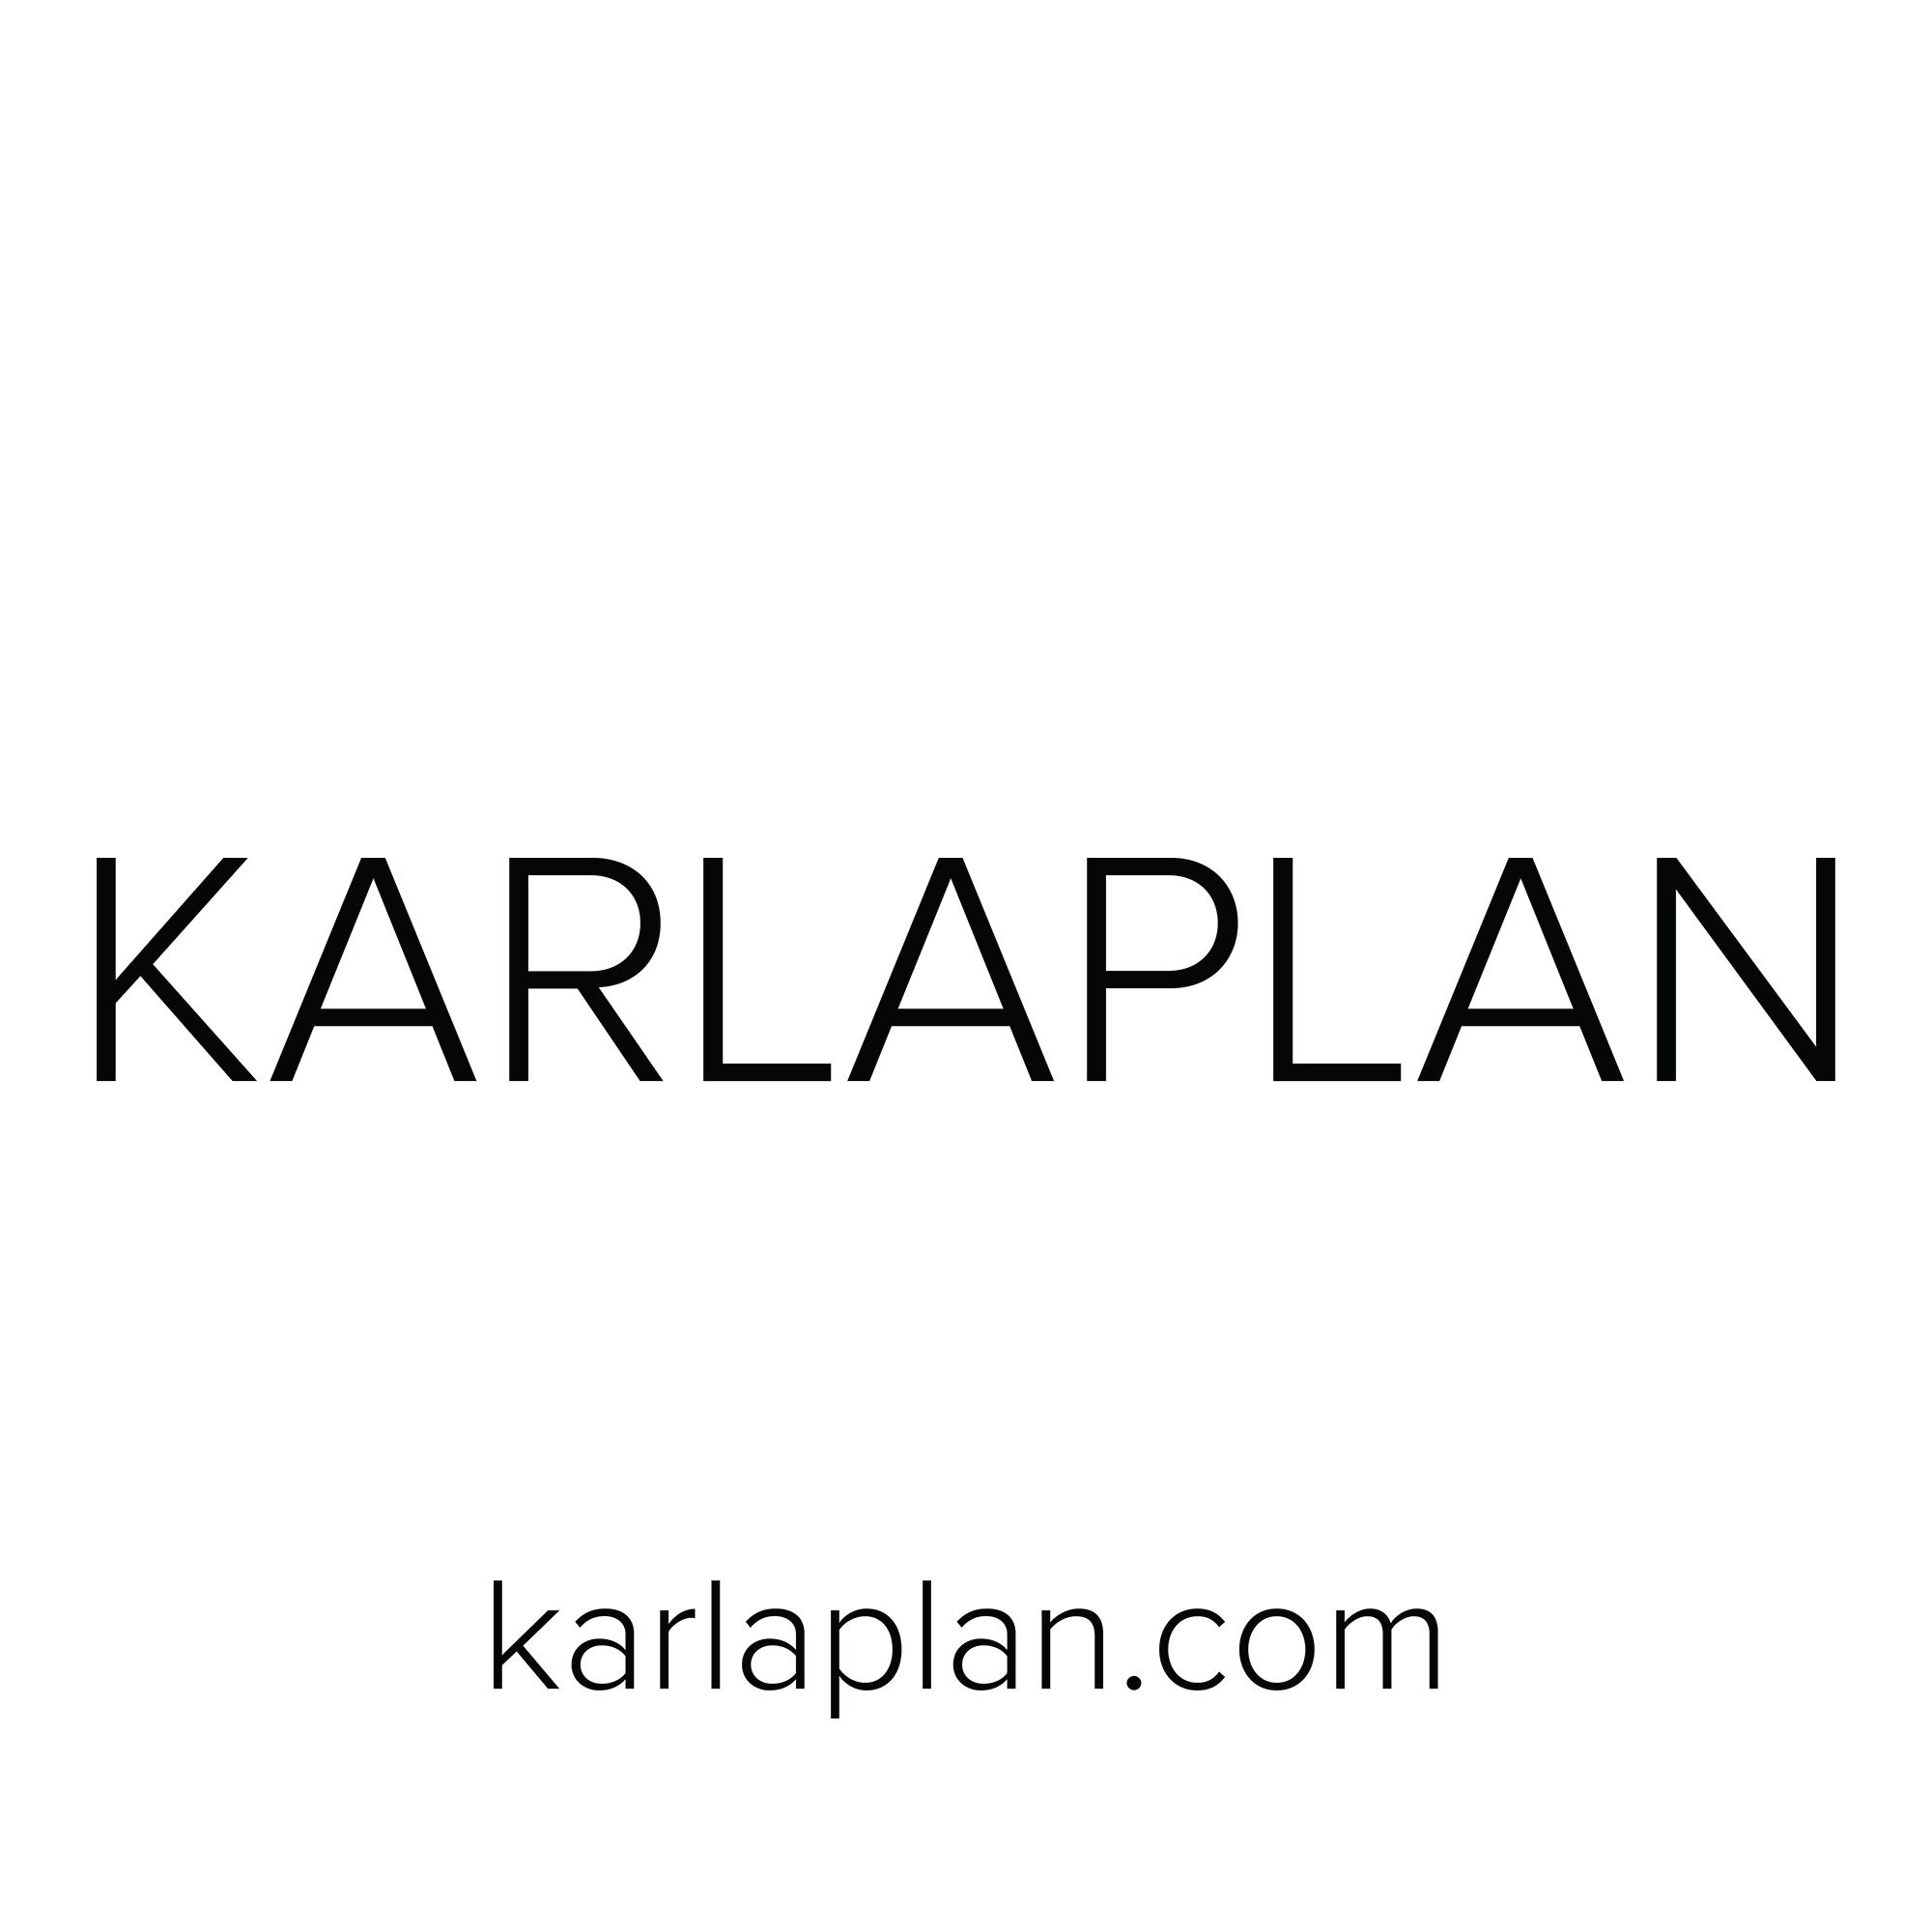 Avatar - Karlaplan